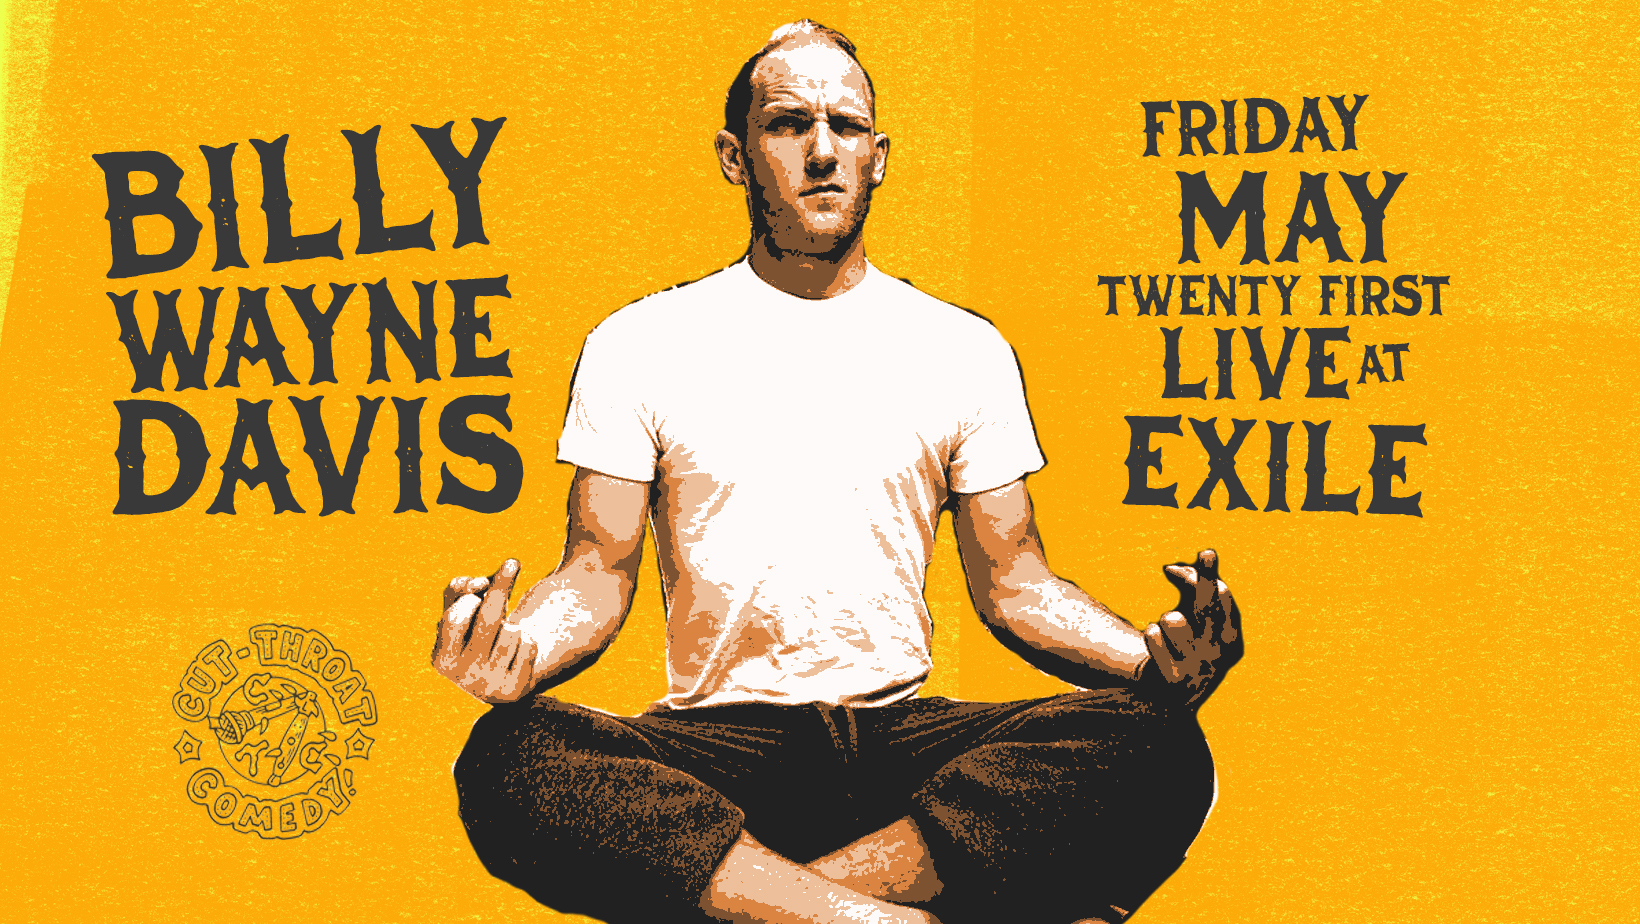 Billy Wayne Davis - Live at Exile